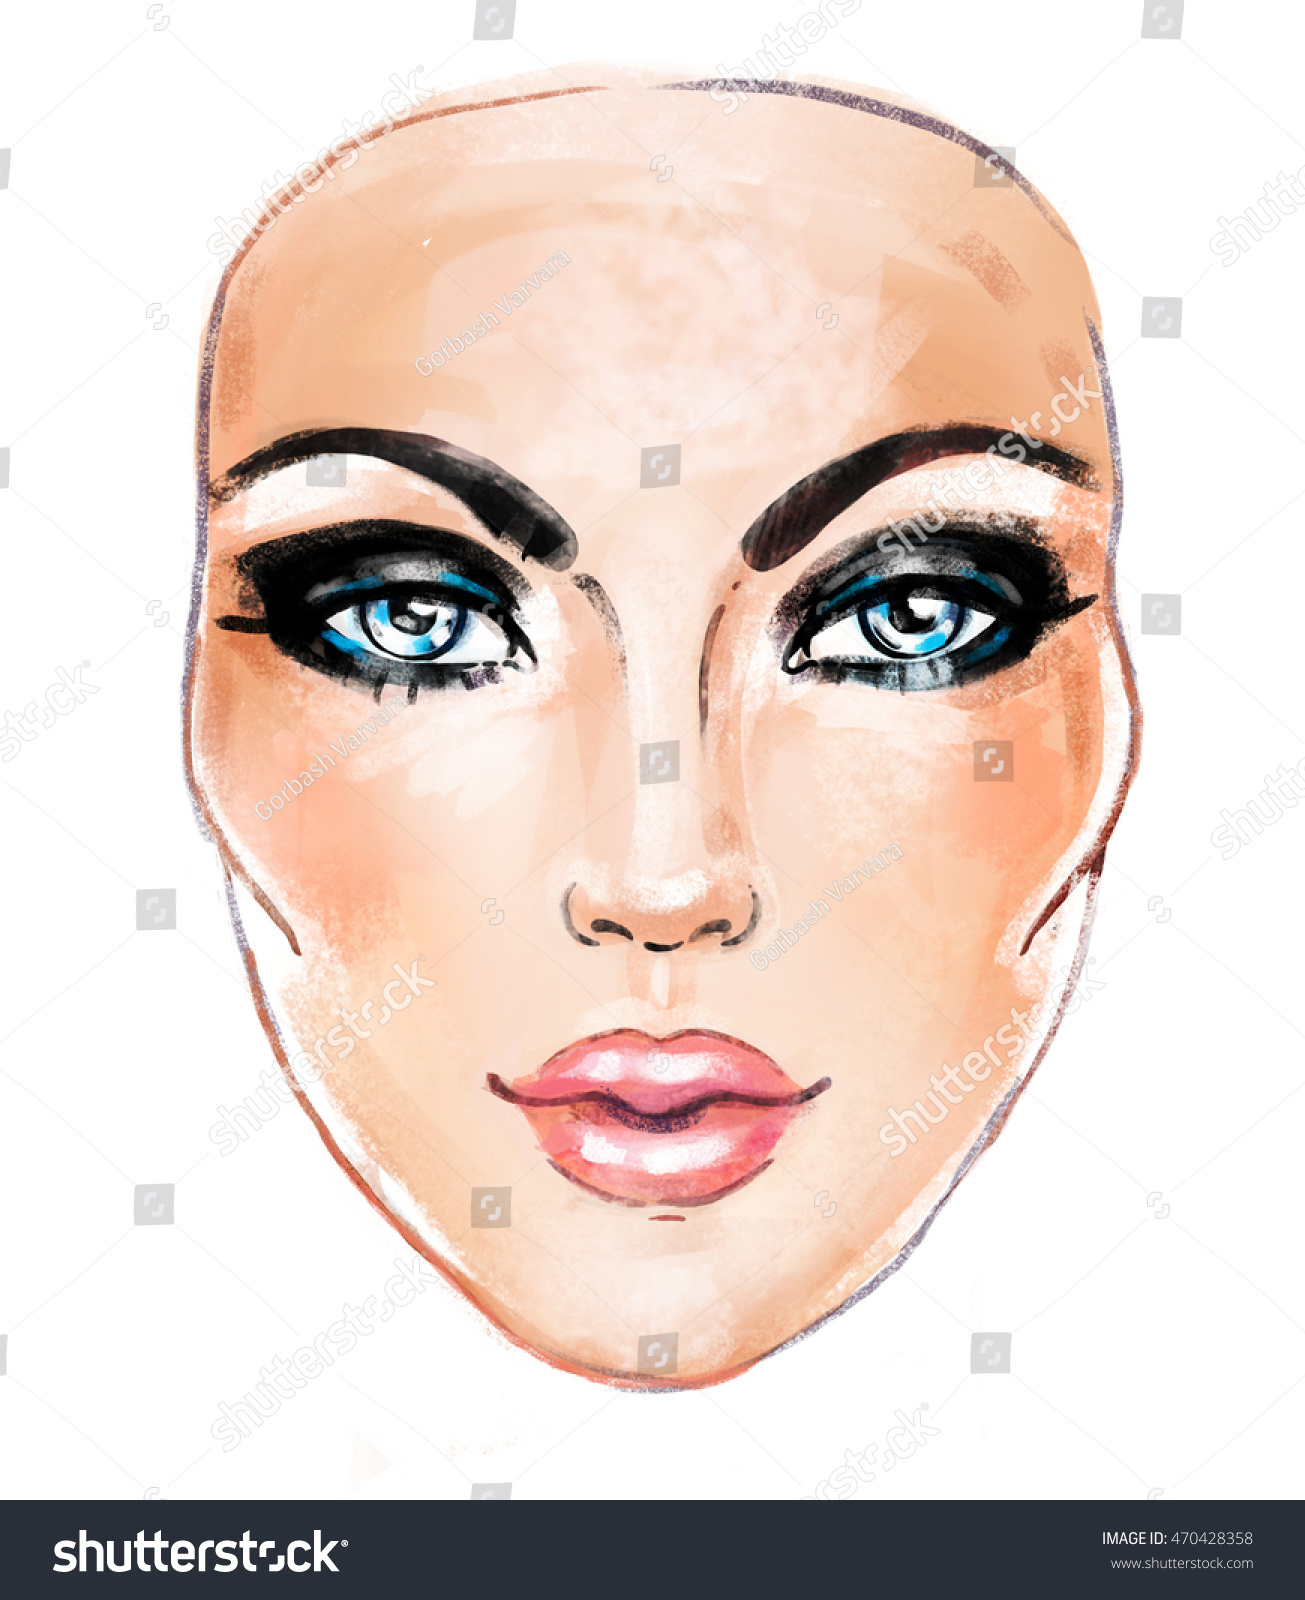 woman face hand painted fashion illustration stock illustration